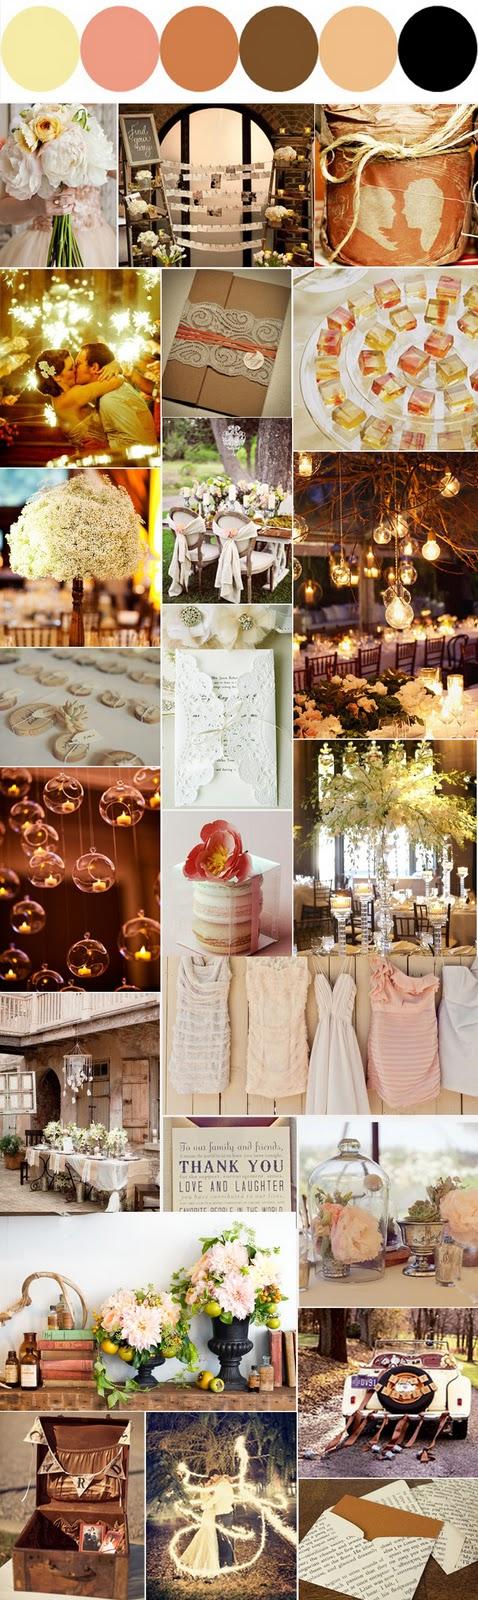 Dan and Britt\'s Wedding Colors   A Bit of Bees Knees